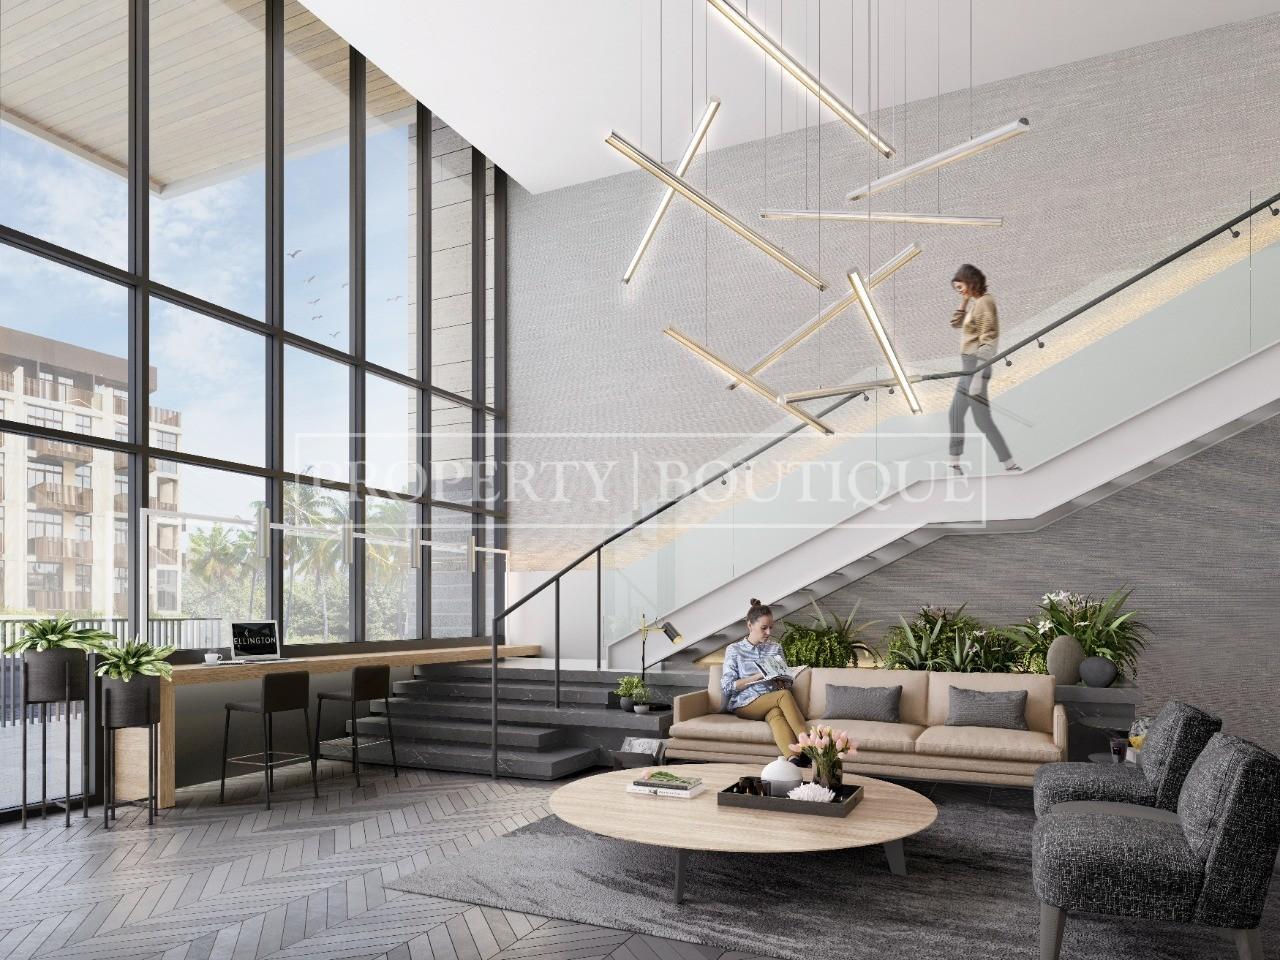 Contemporary Studio | High grade | Investor & End User - Image 6